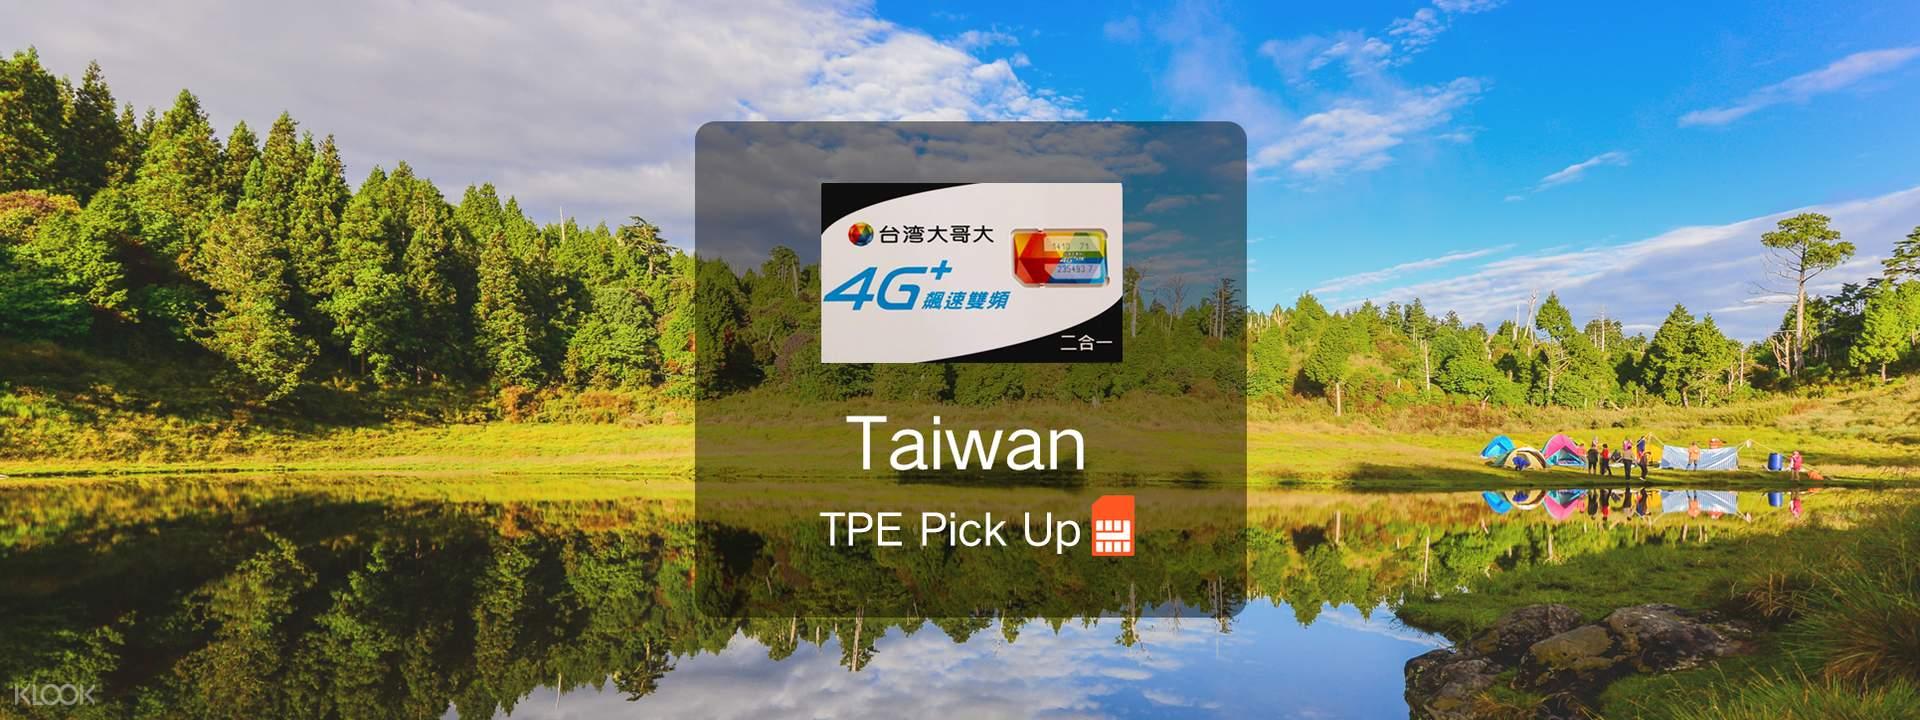 4G SIM Card with Calls (Taipei Taoyuan Airport Pick Up